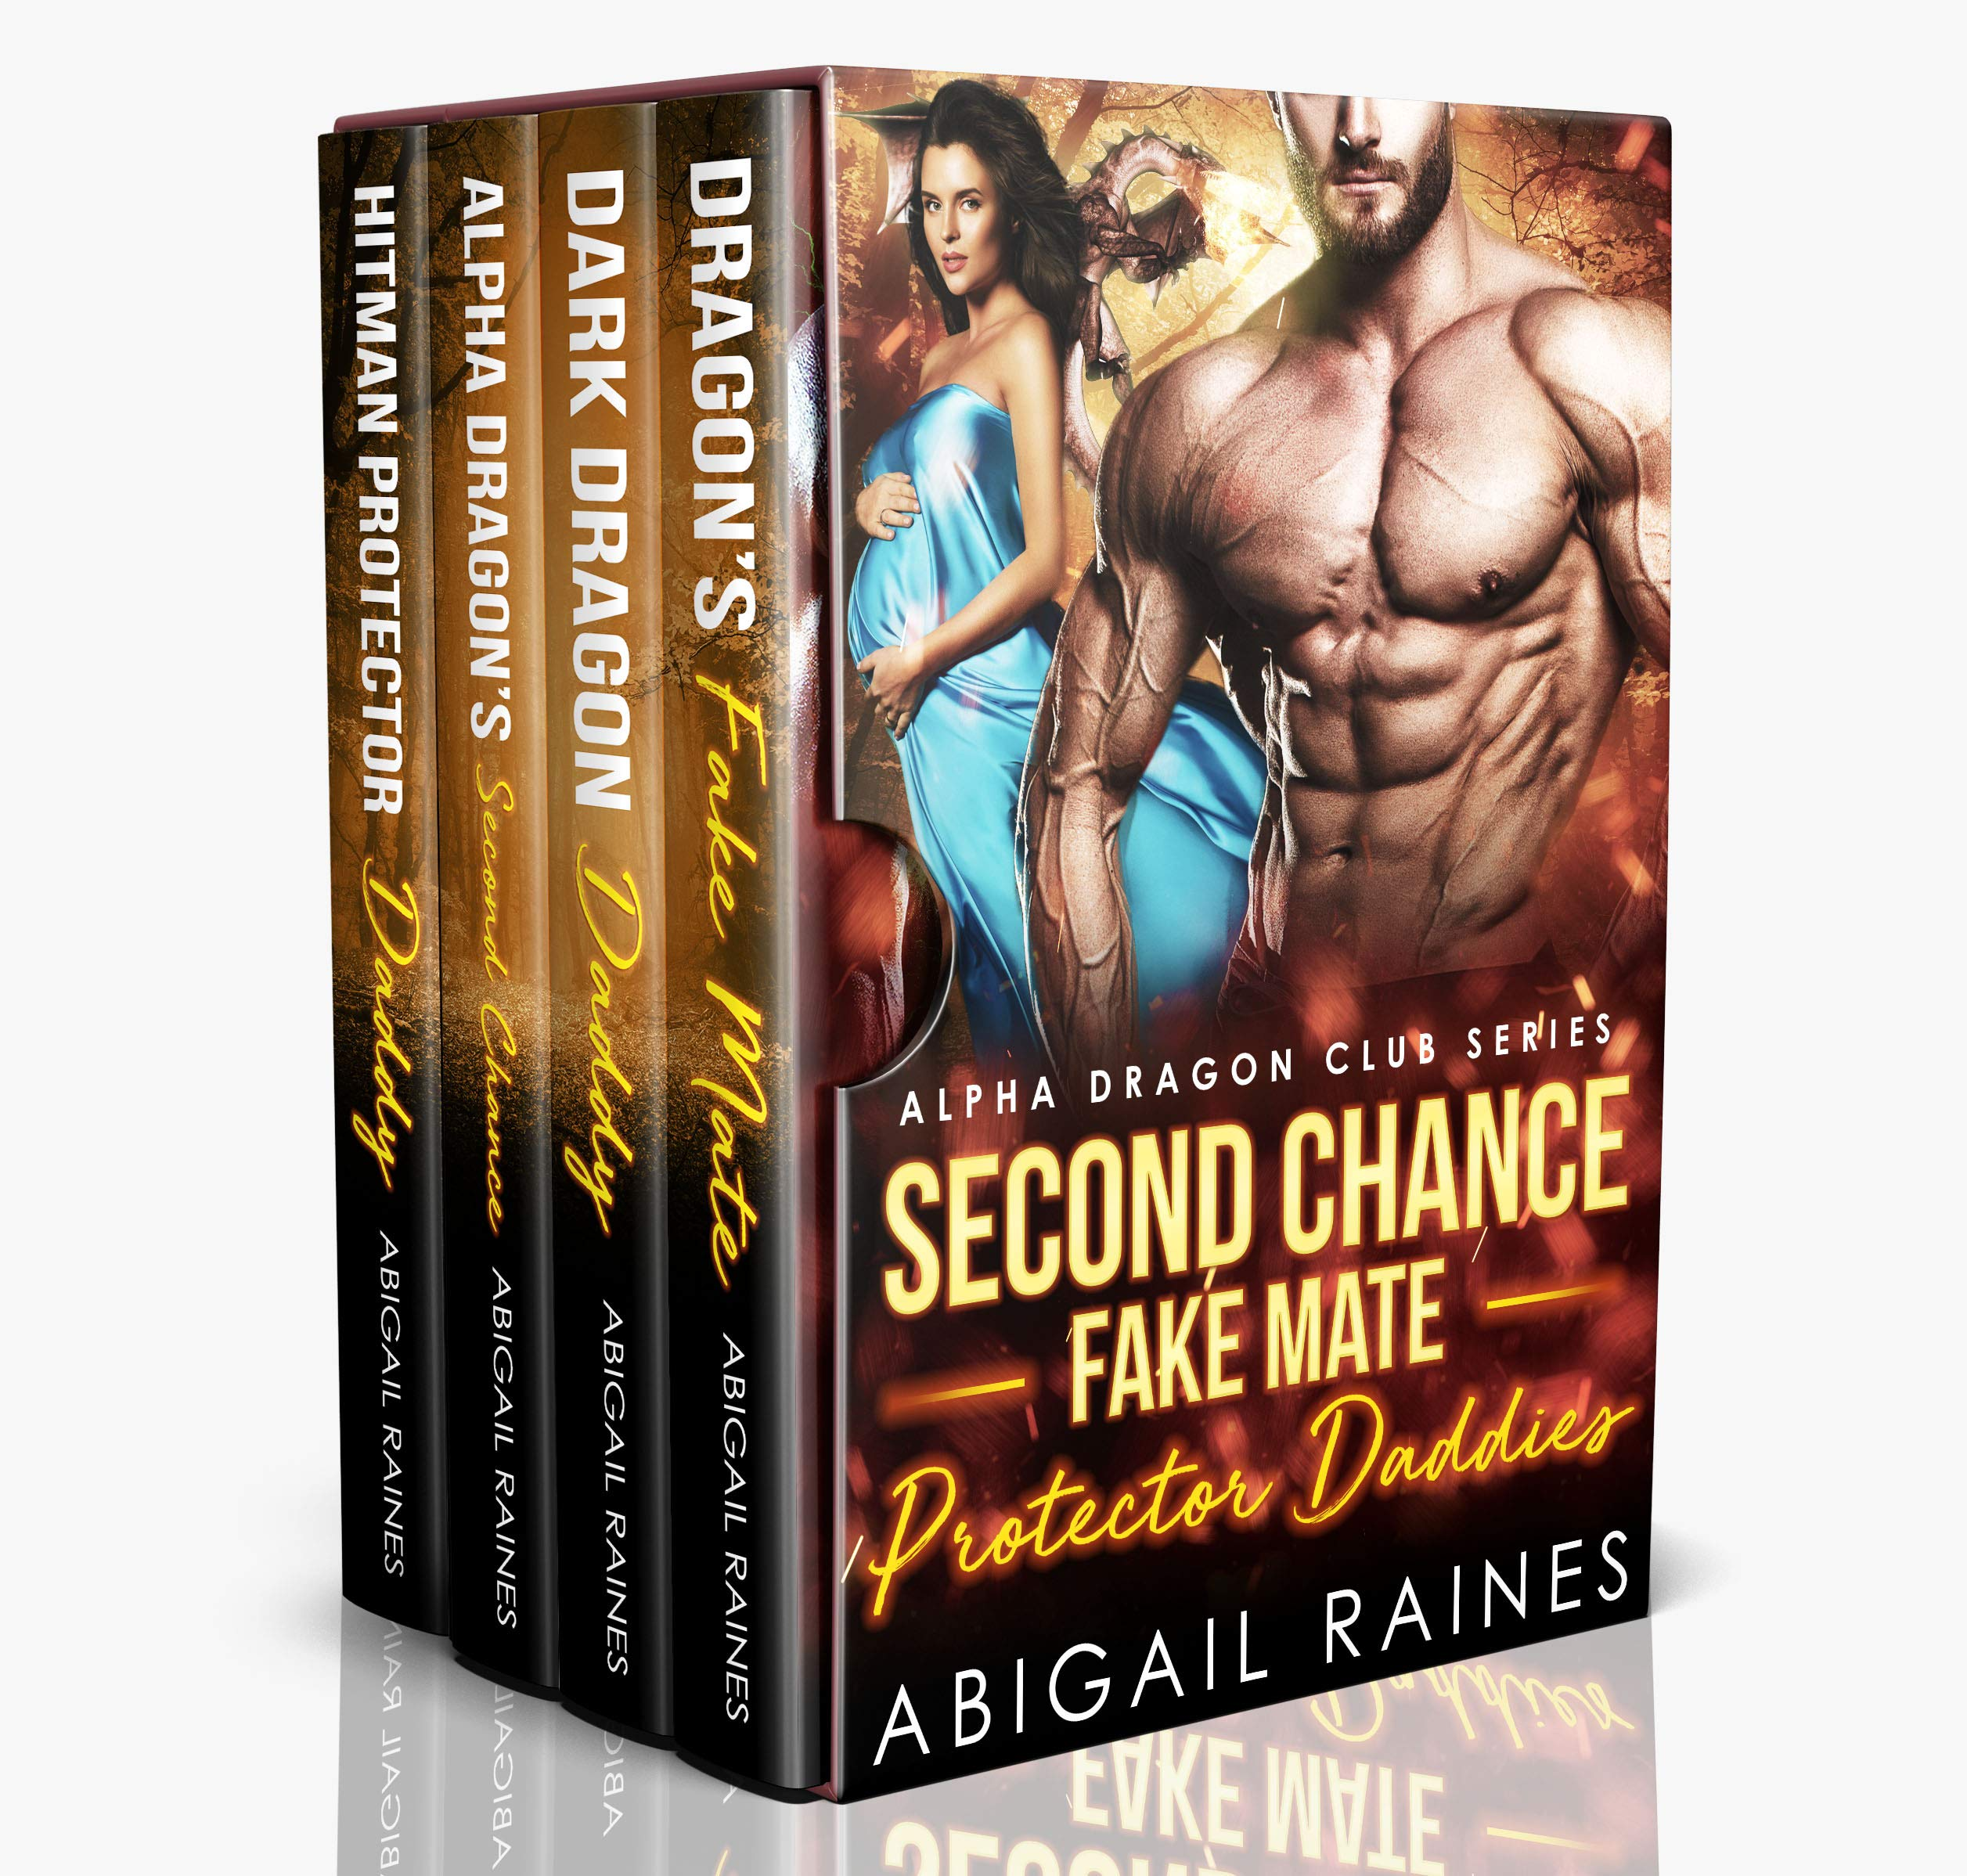 Second Chance Fake Mate Protector Daddies (Alpha Dragon Club) (English Edition)